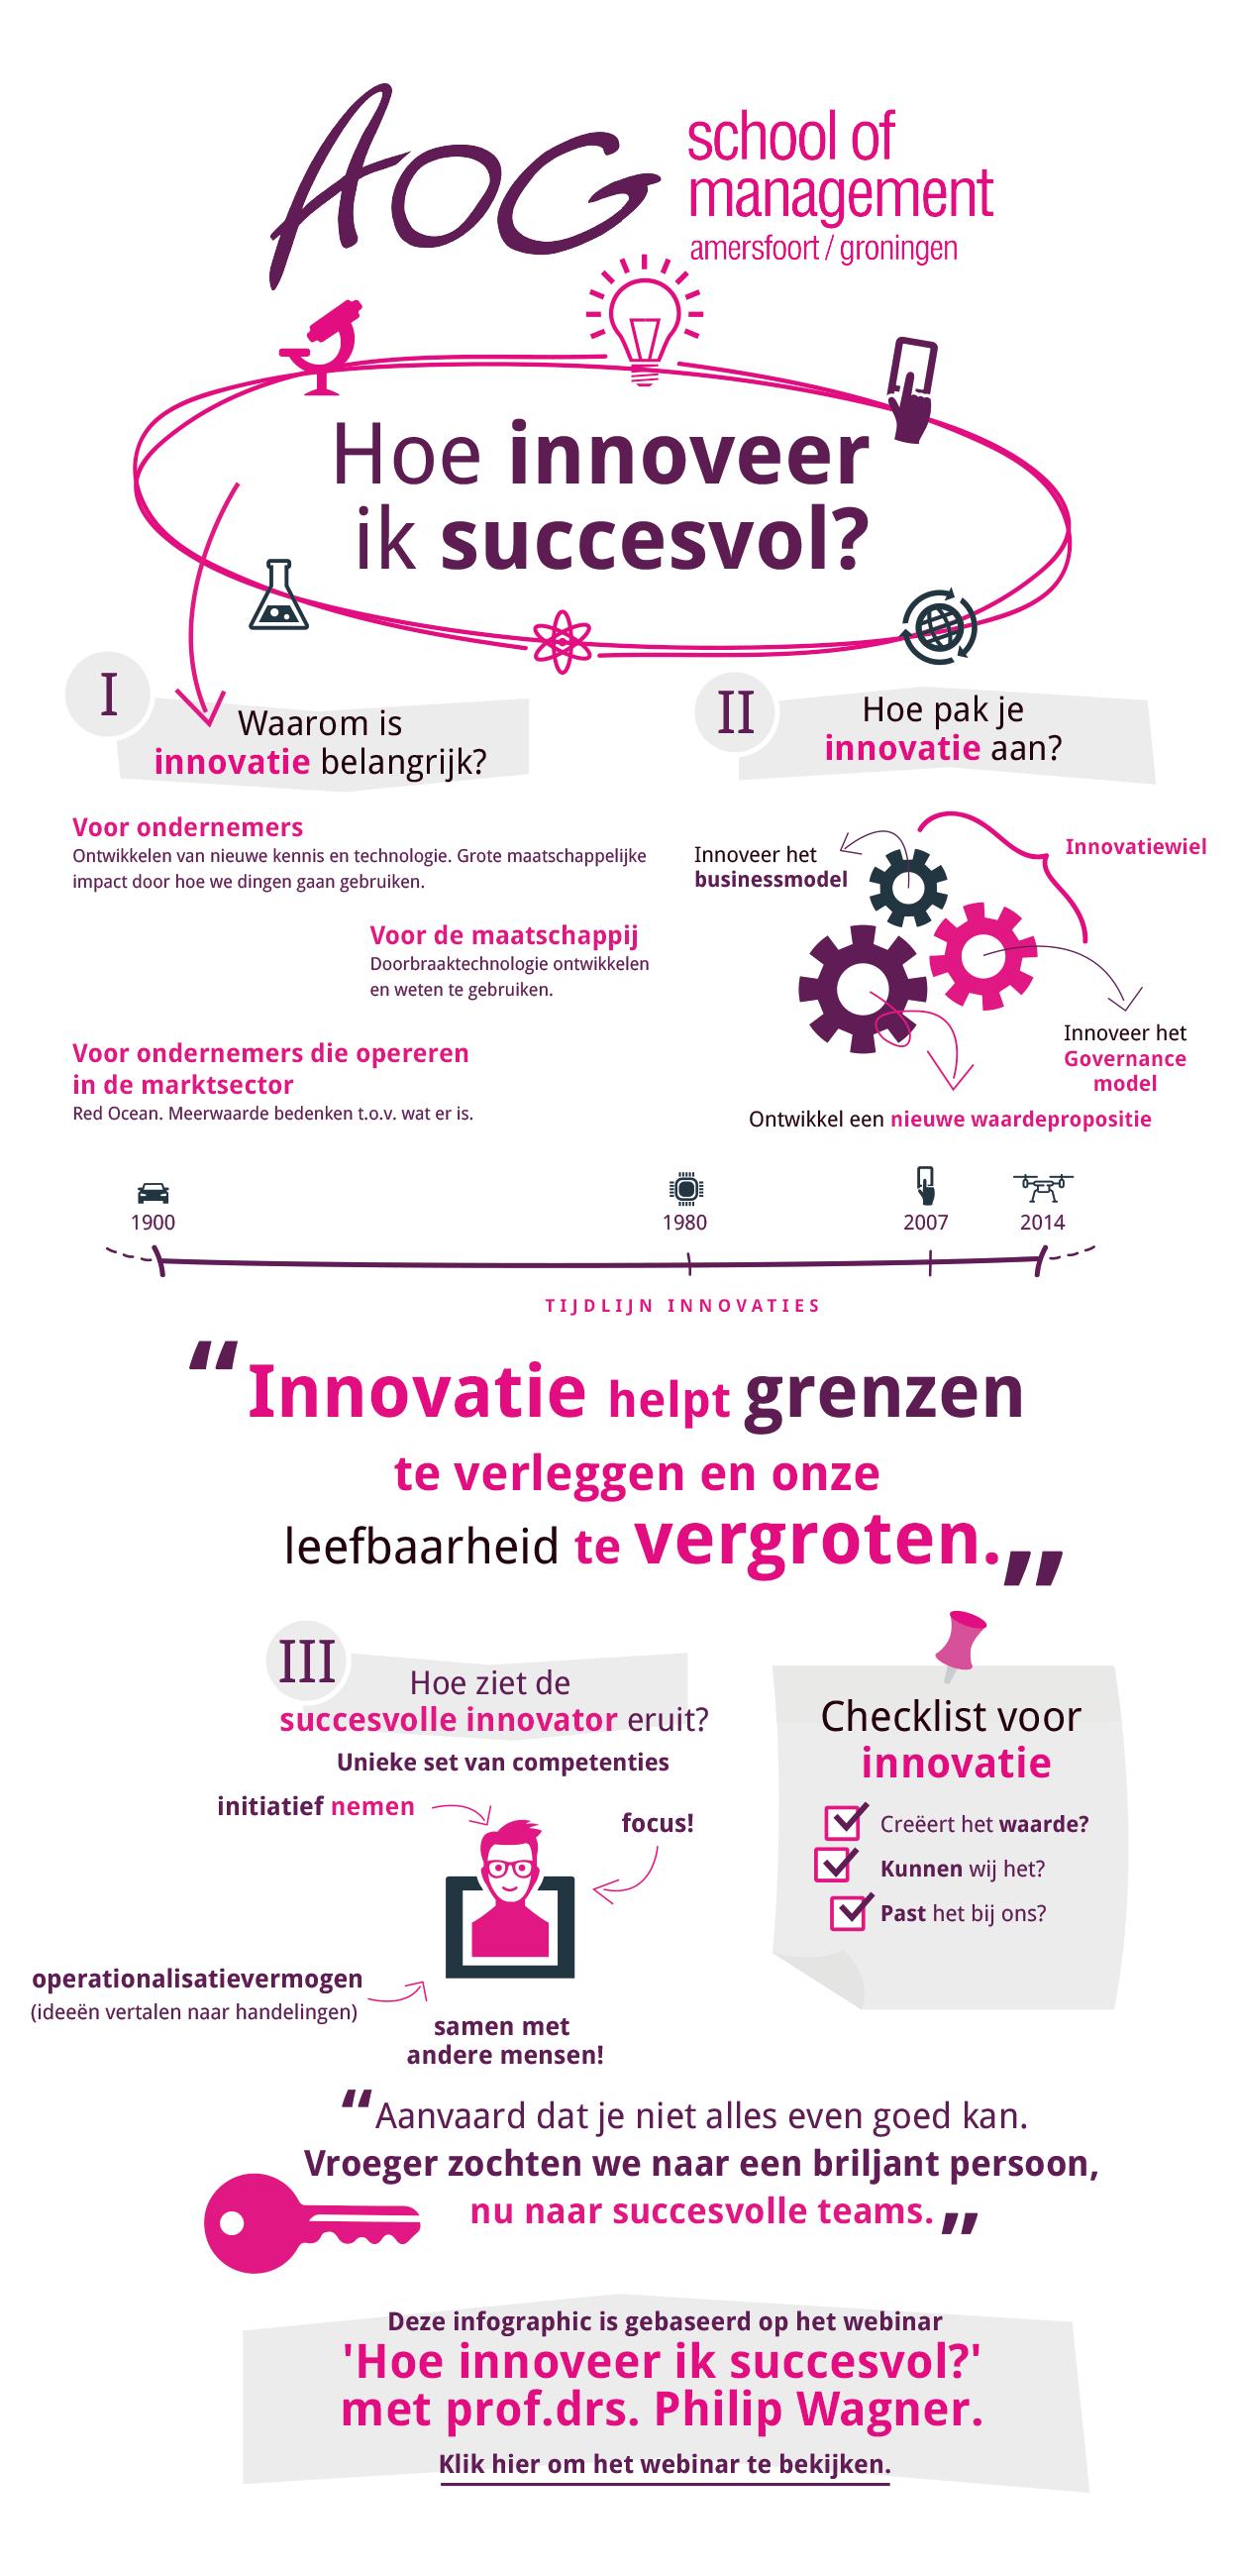 Infographic 'Hoe innoveer ik succesvol?'